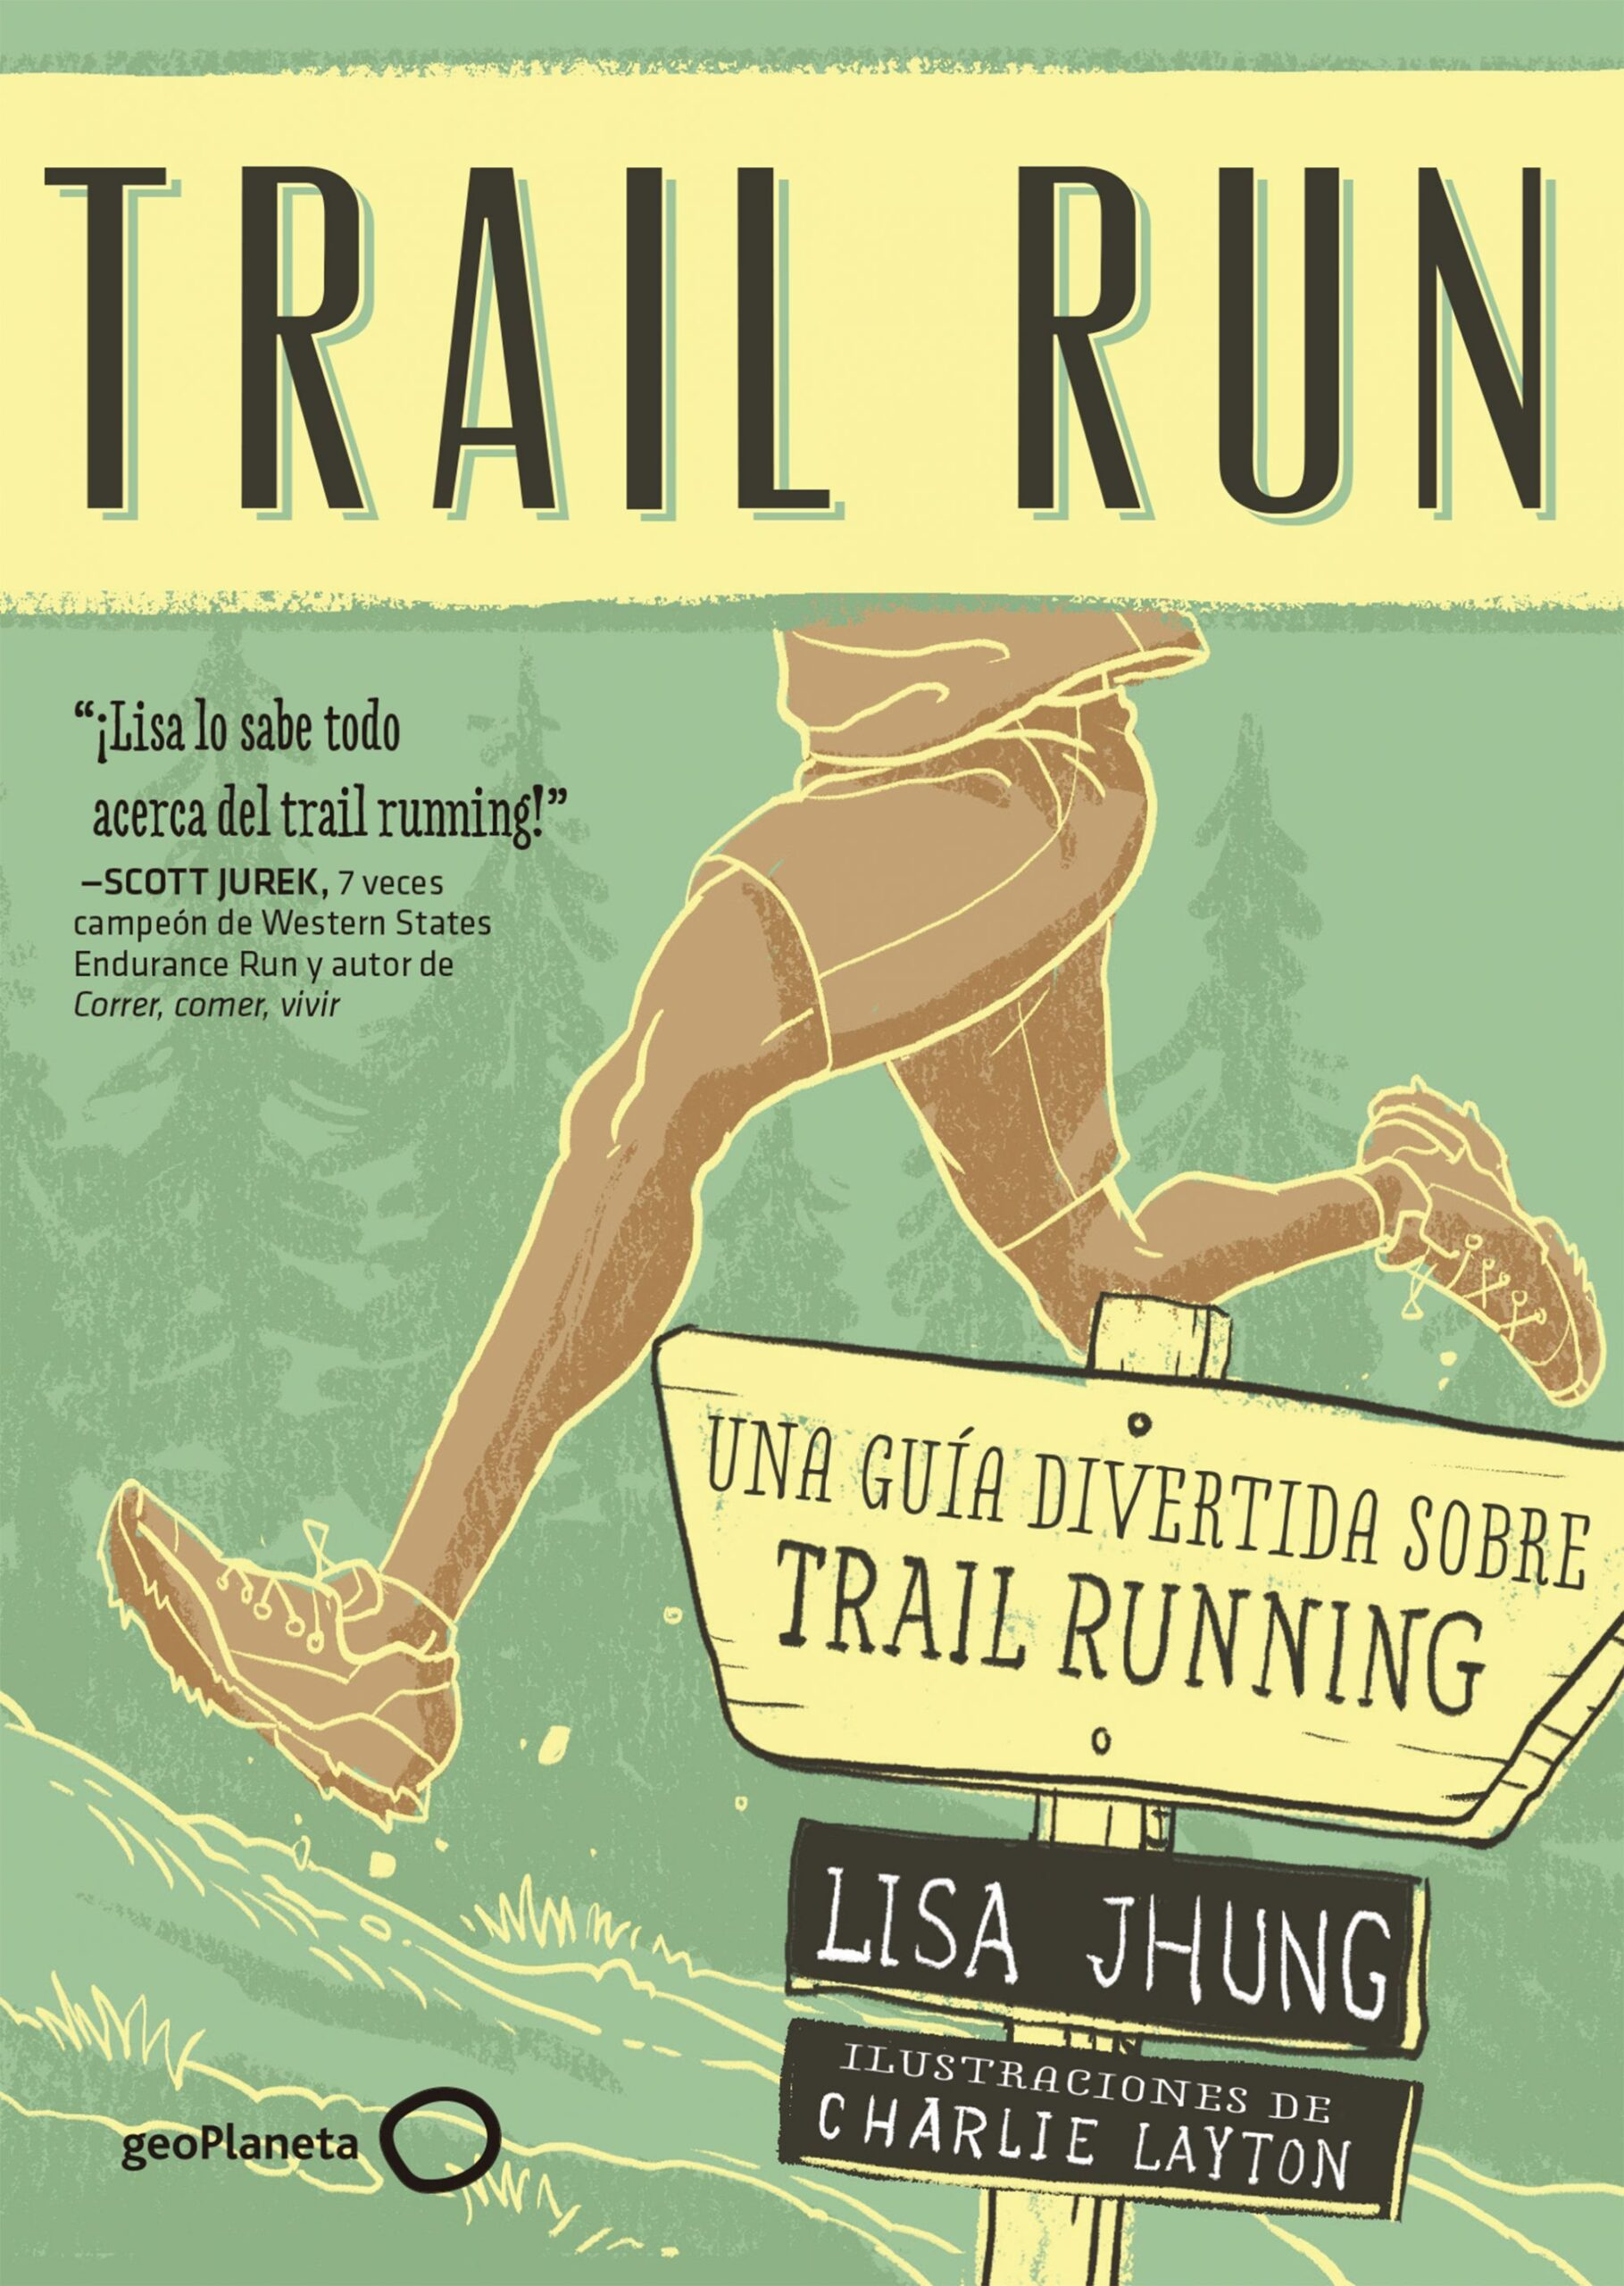 trail run una guía desenfadada para salir corriendo